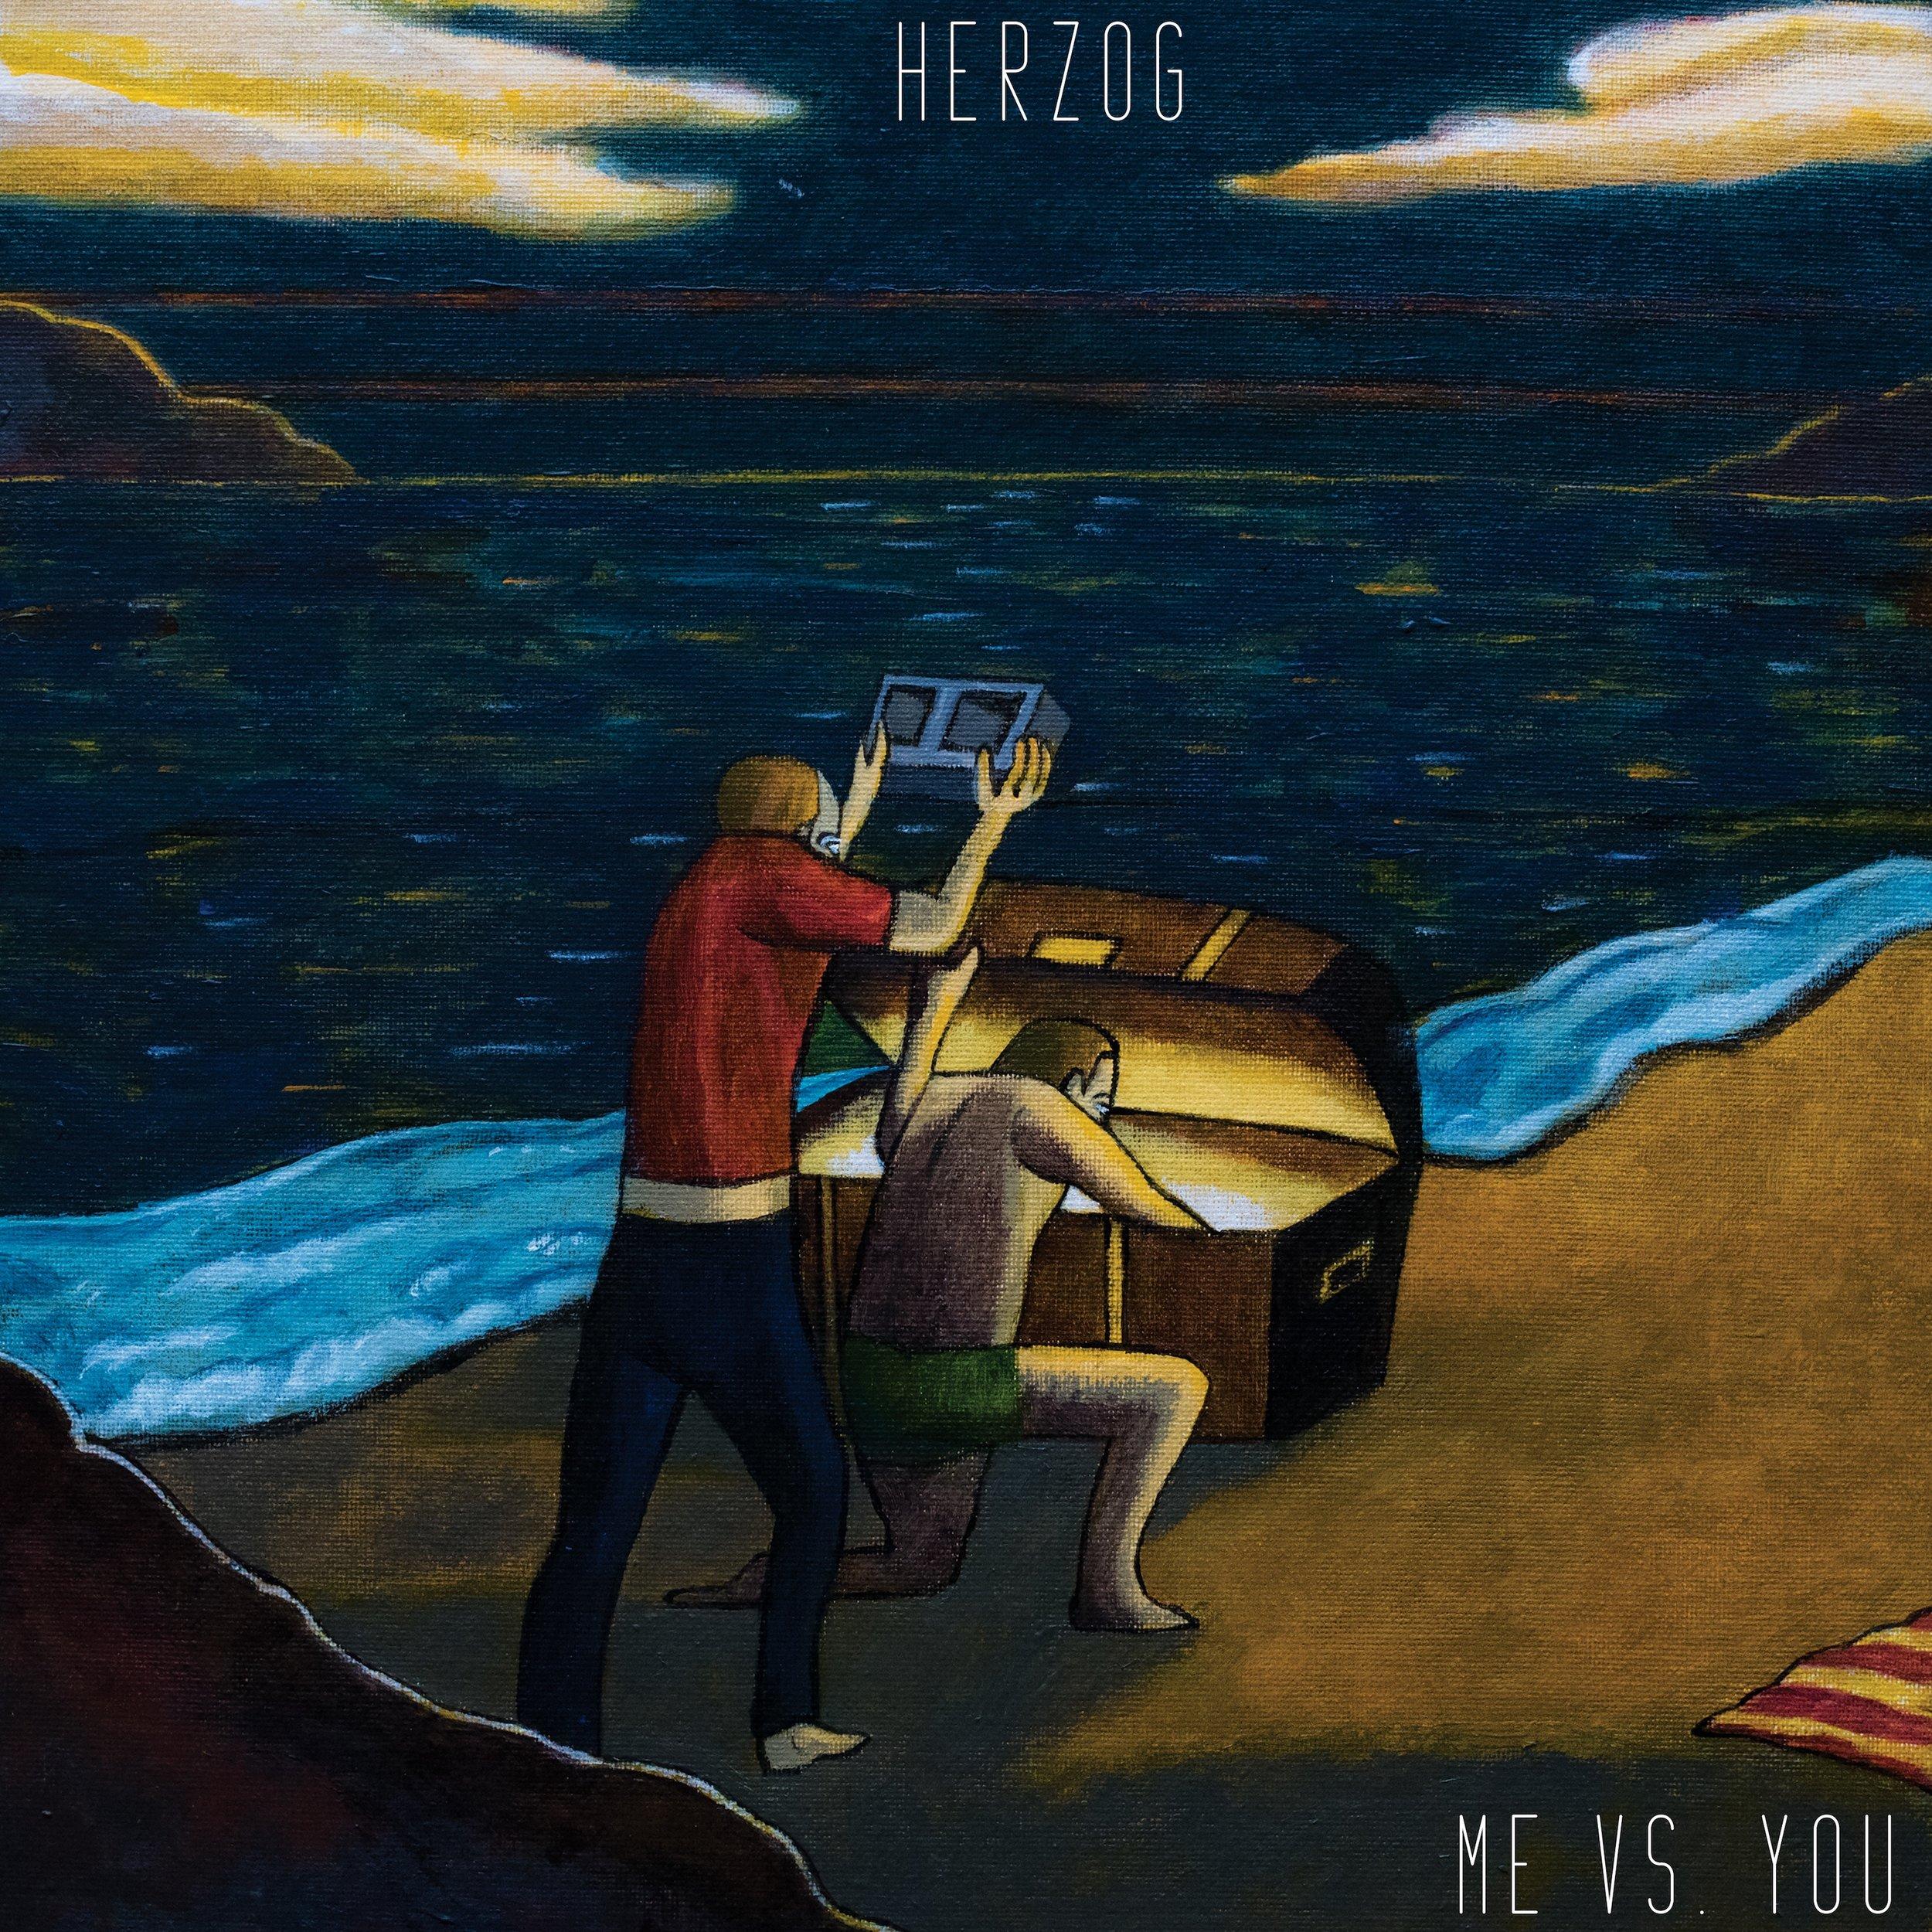 ESR-056-Herzog -Cover.jpg